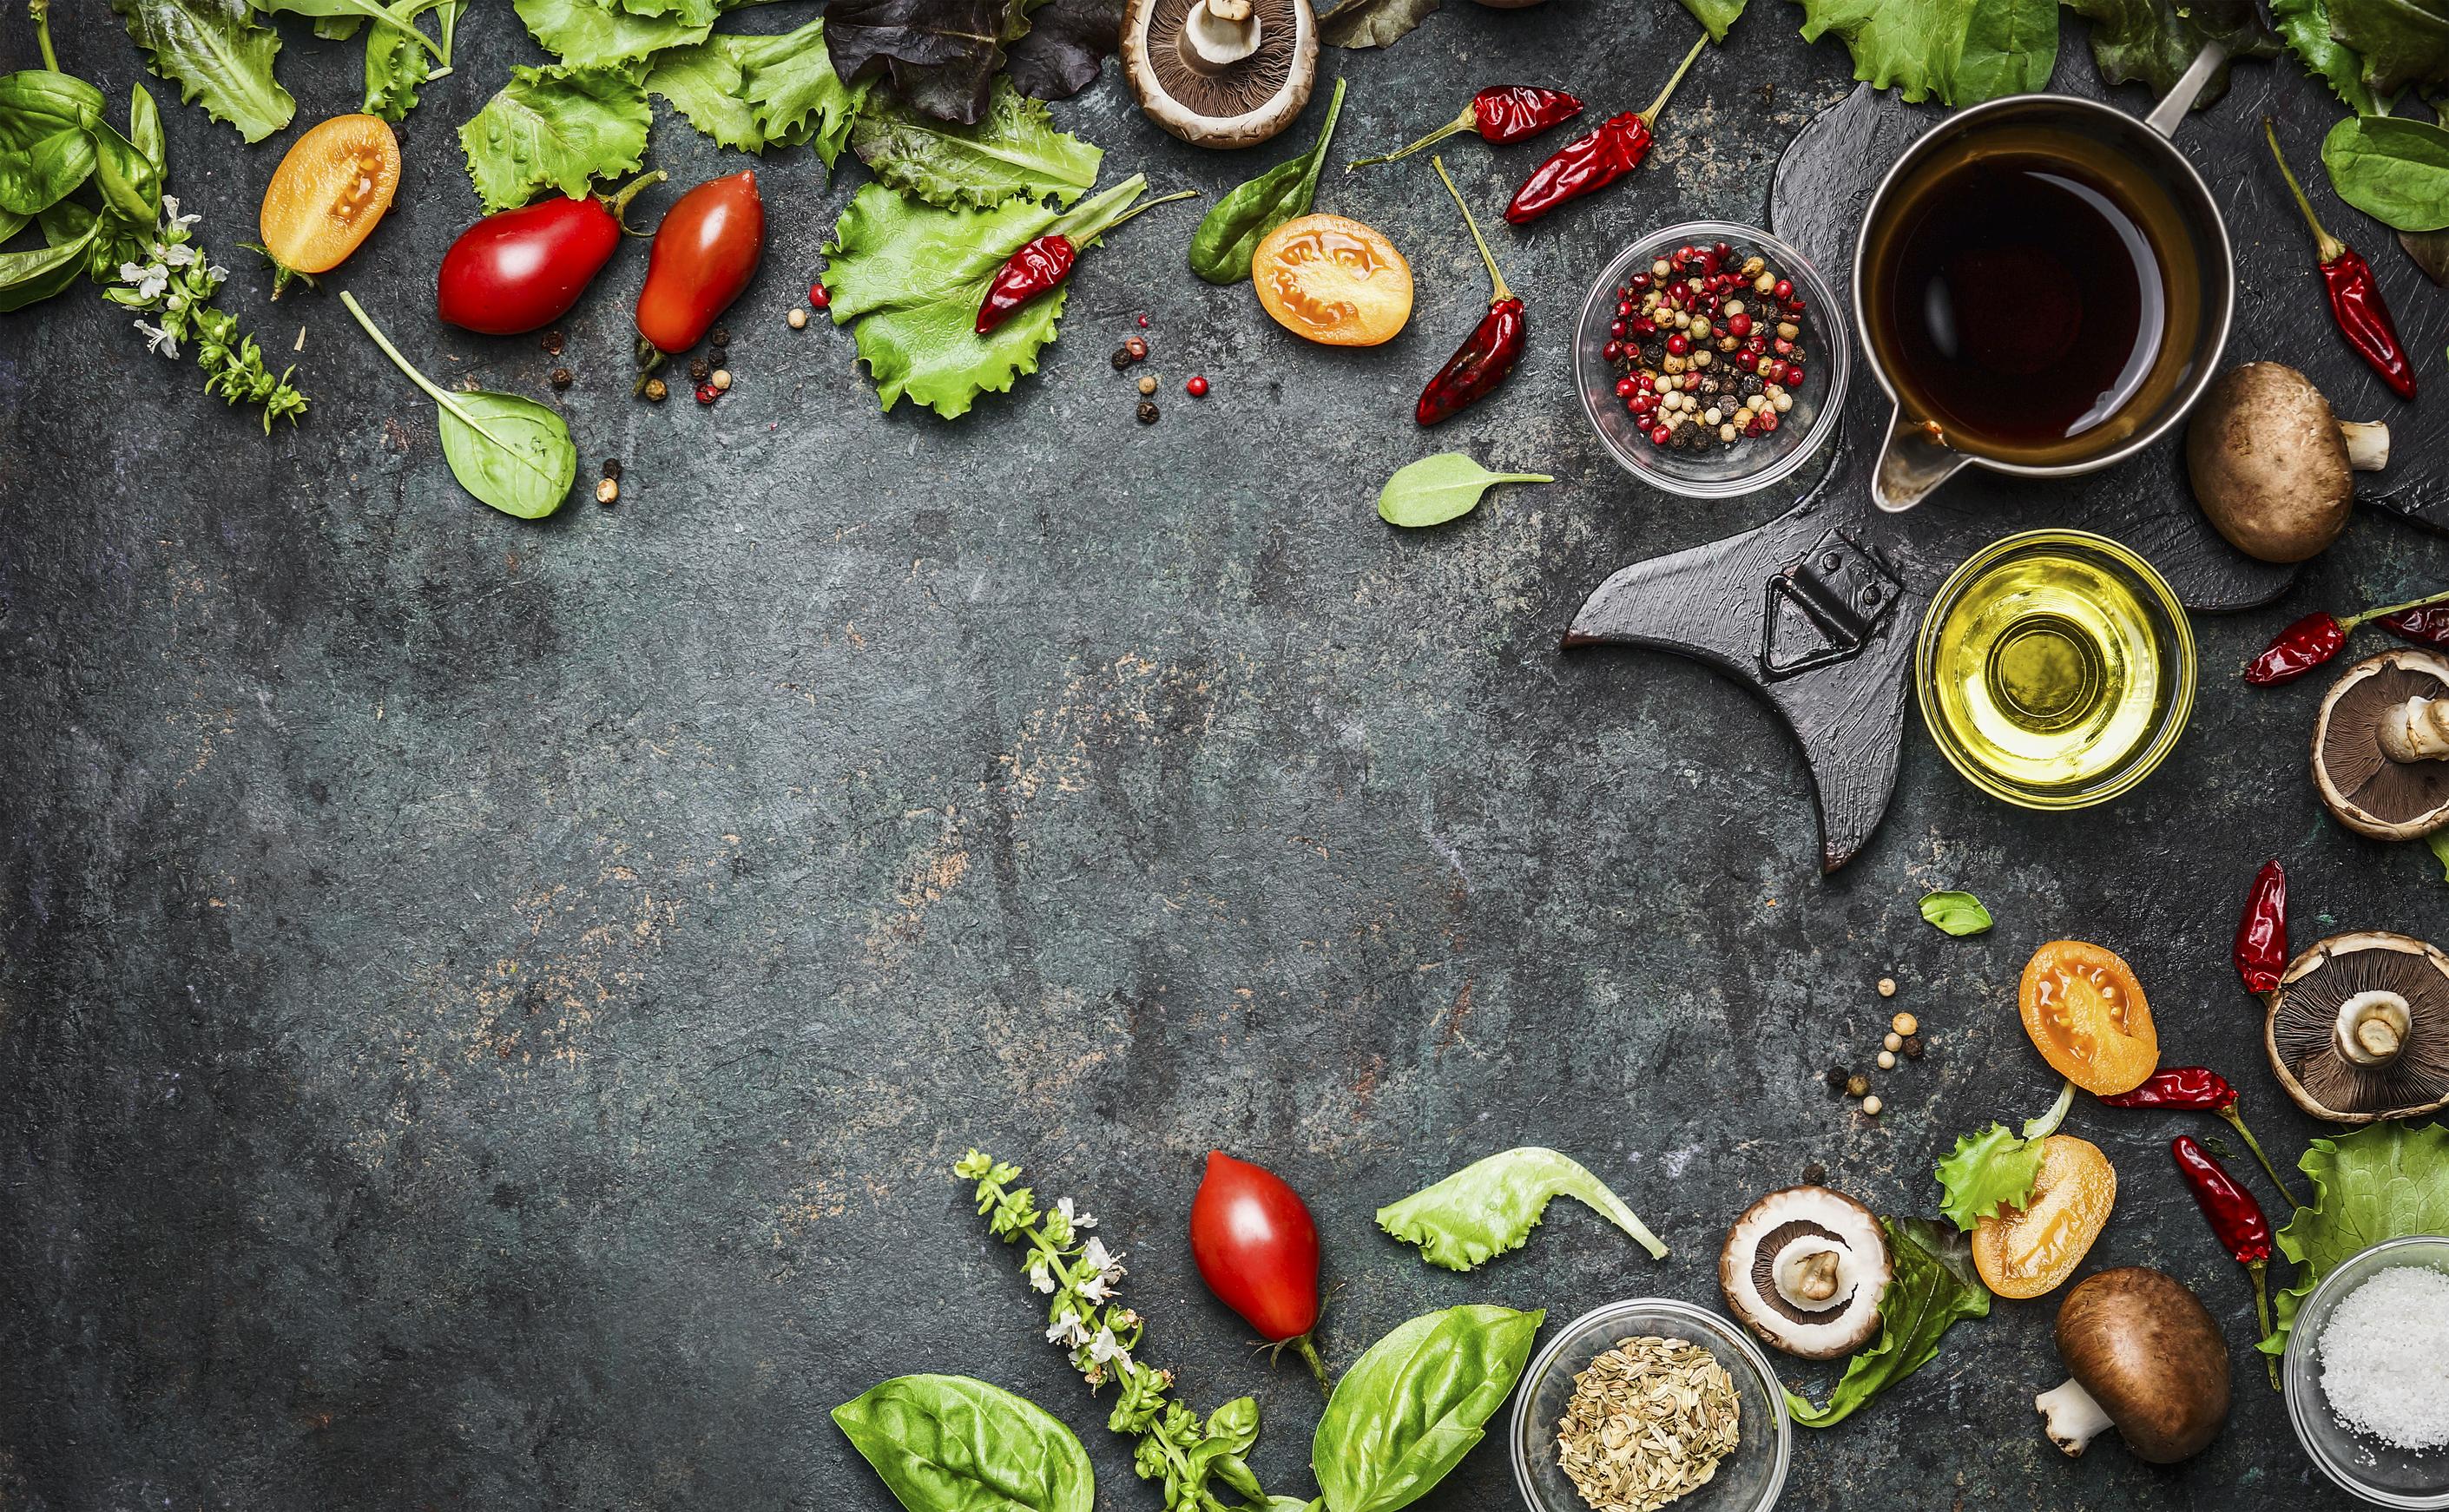 Wallpaper Natural Food